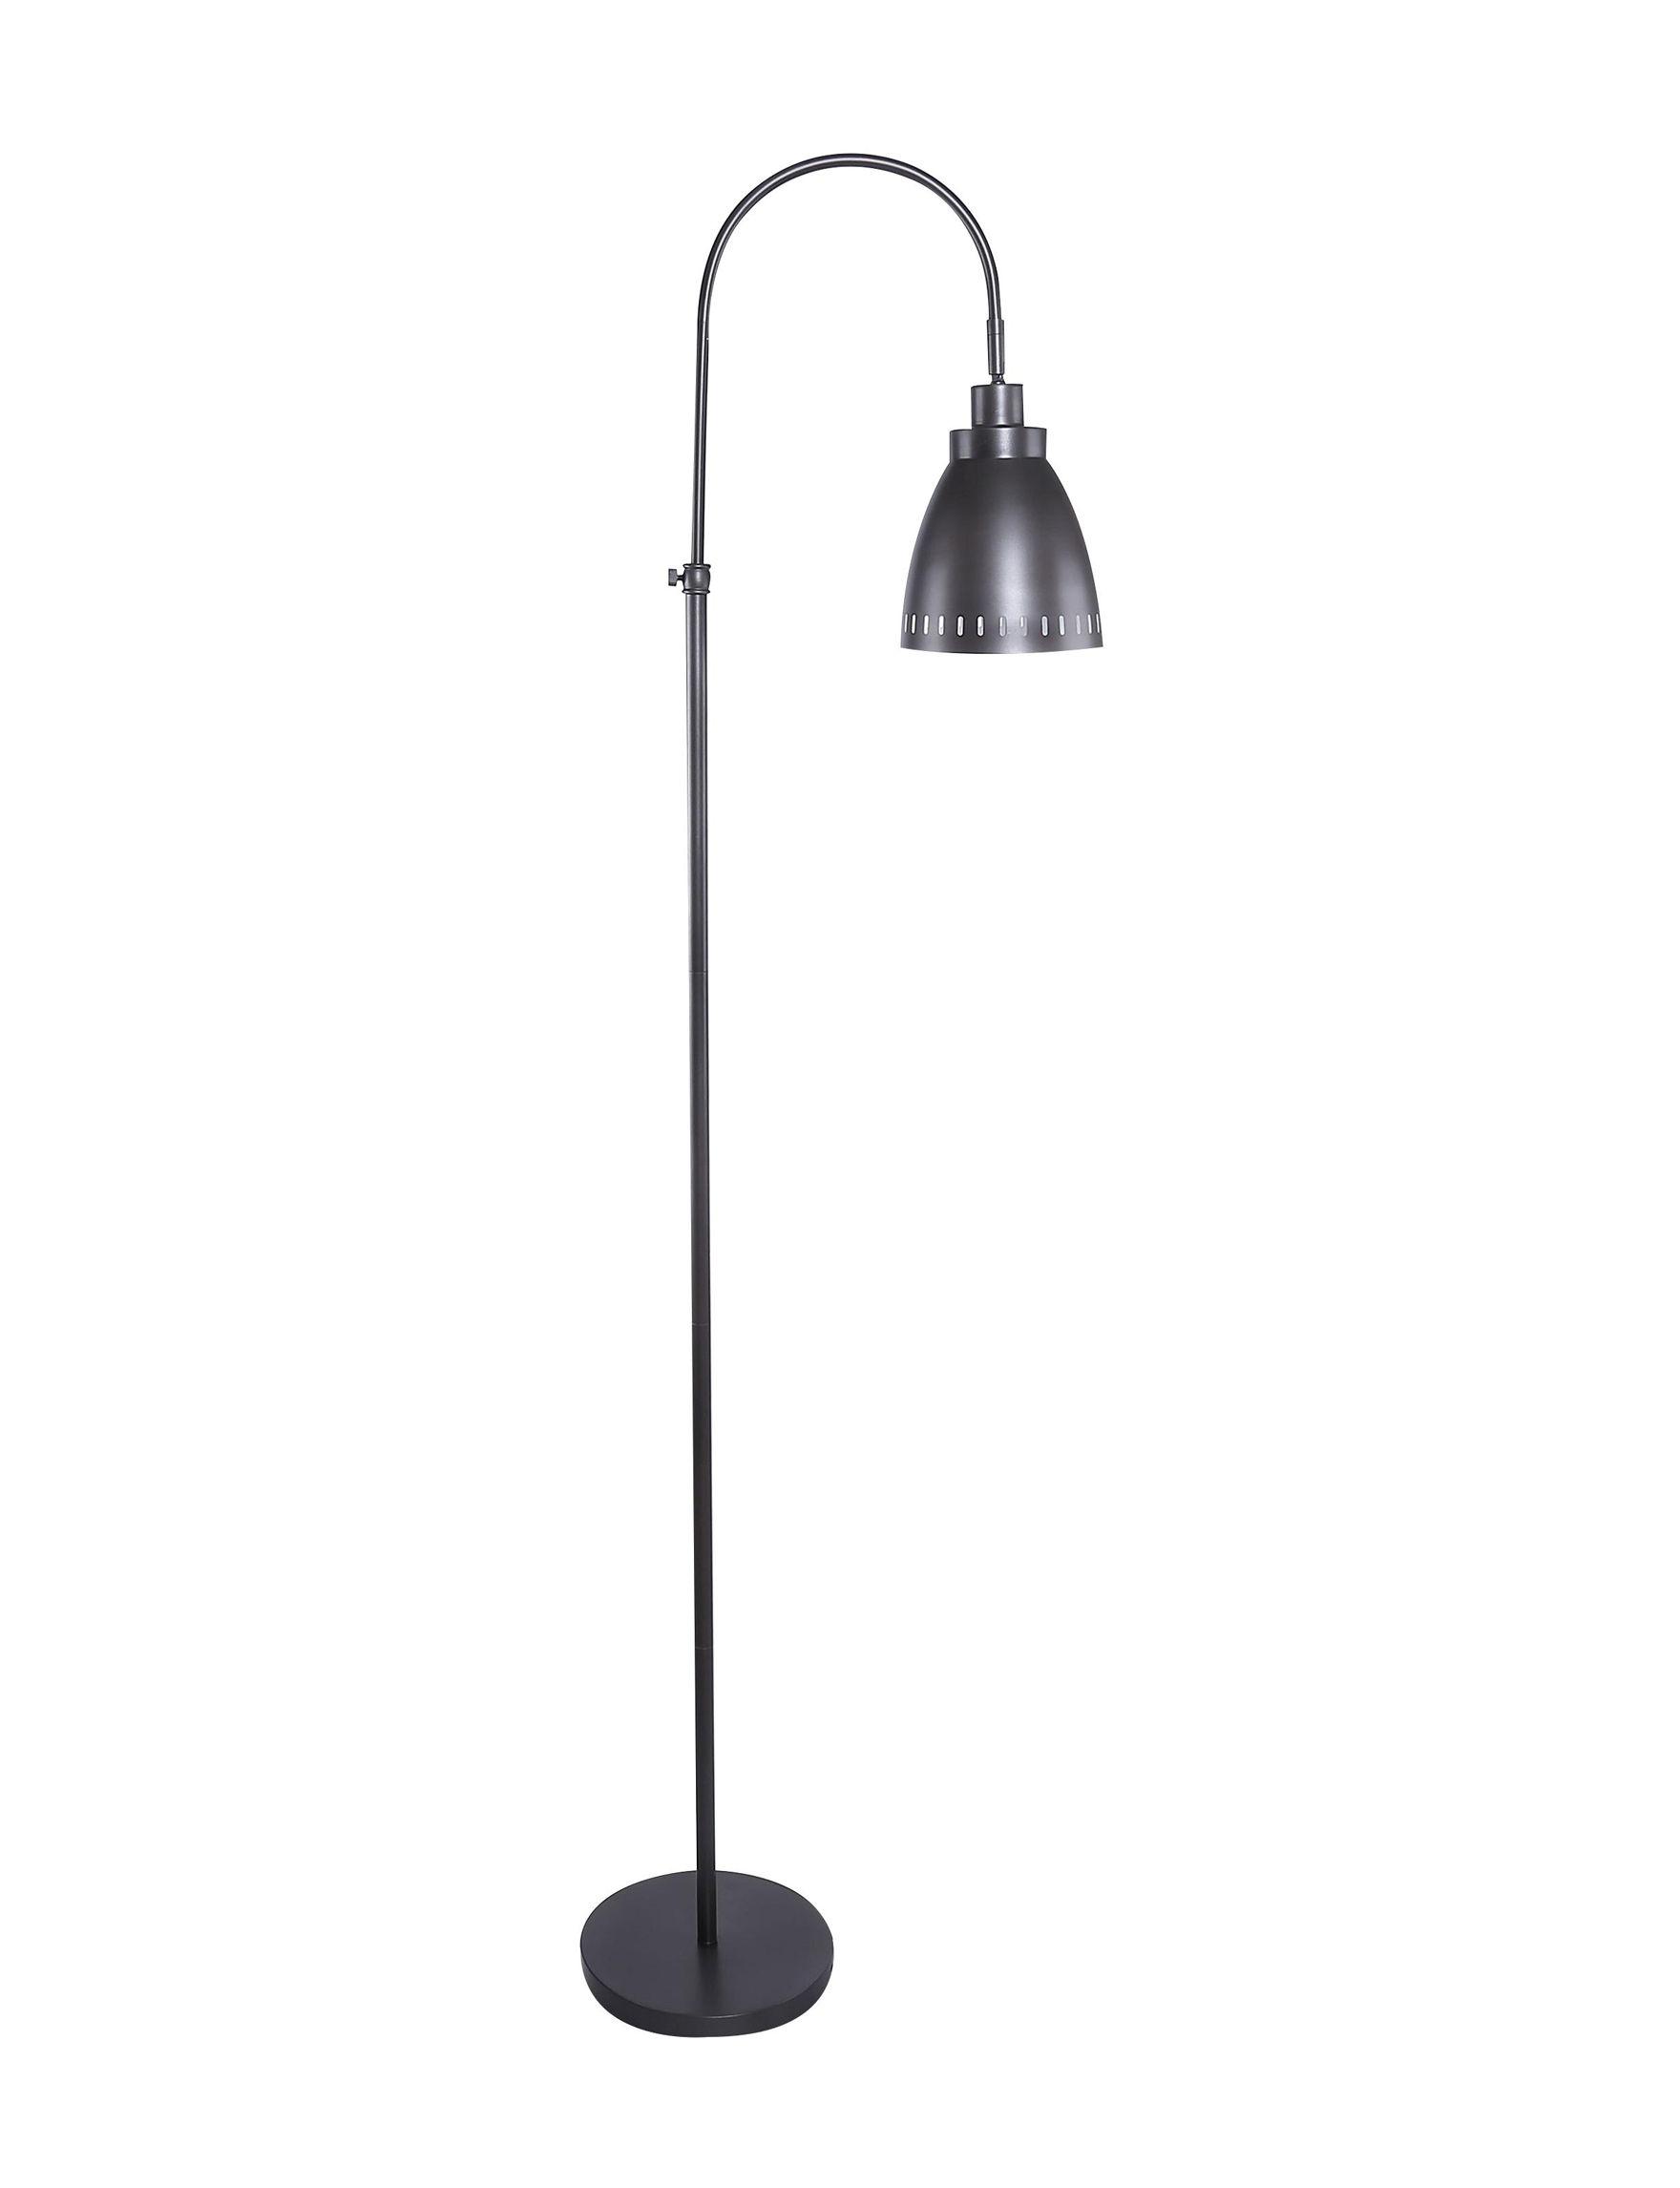 Grandview Gallery Black Floor Lamps Lighting & Lamps